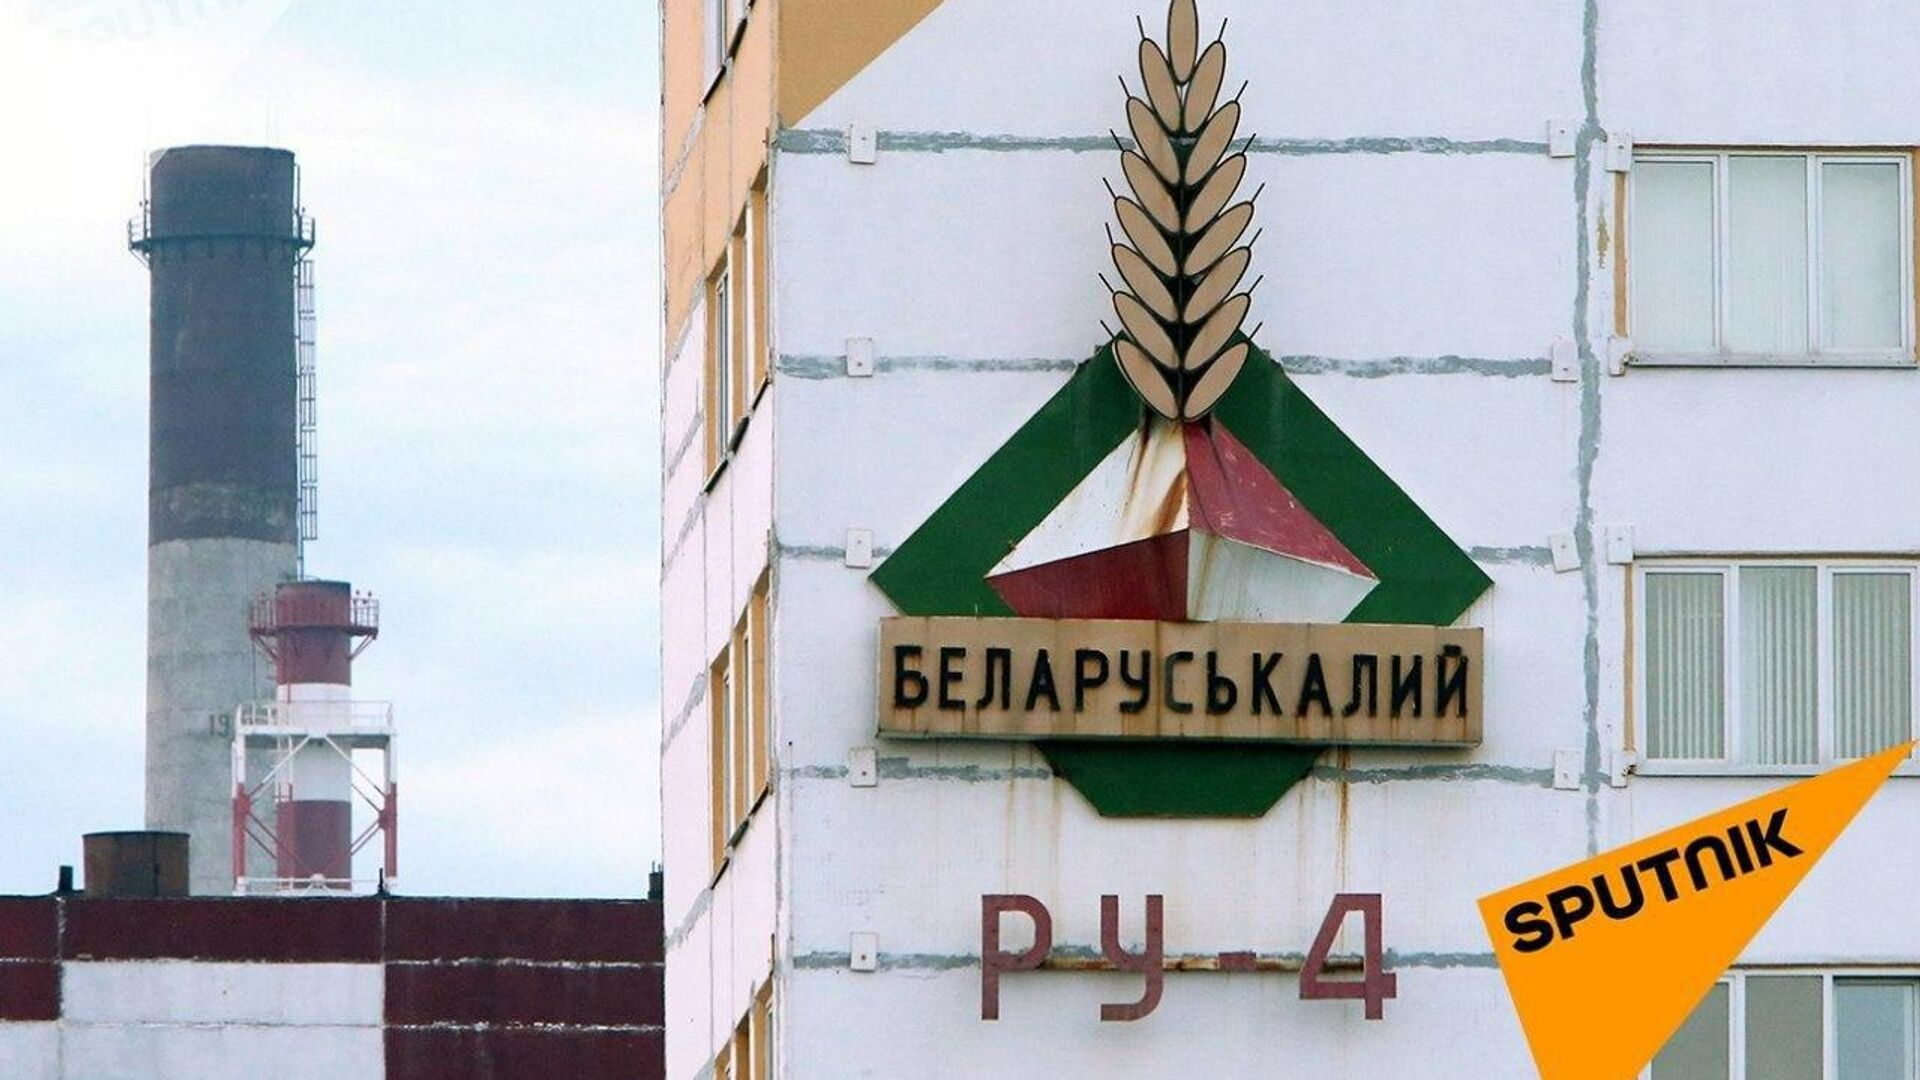 Беларуськалий - РИА Новости, 1920, 26.10.2020